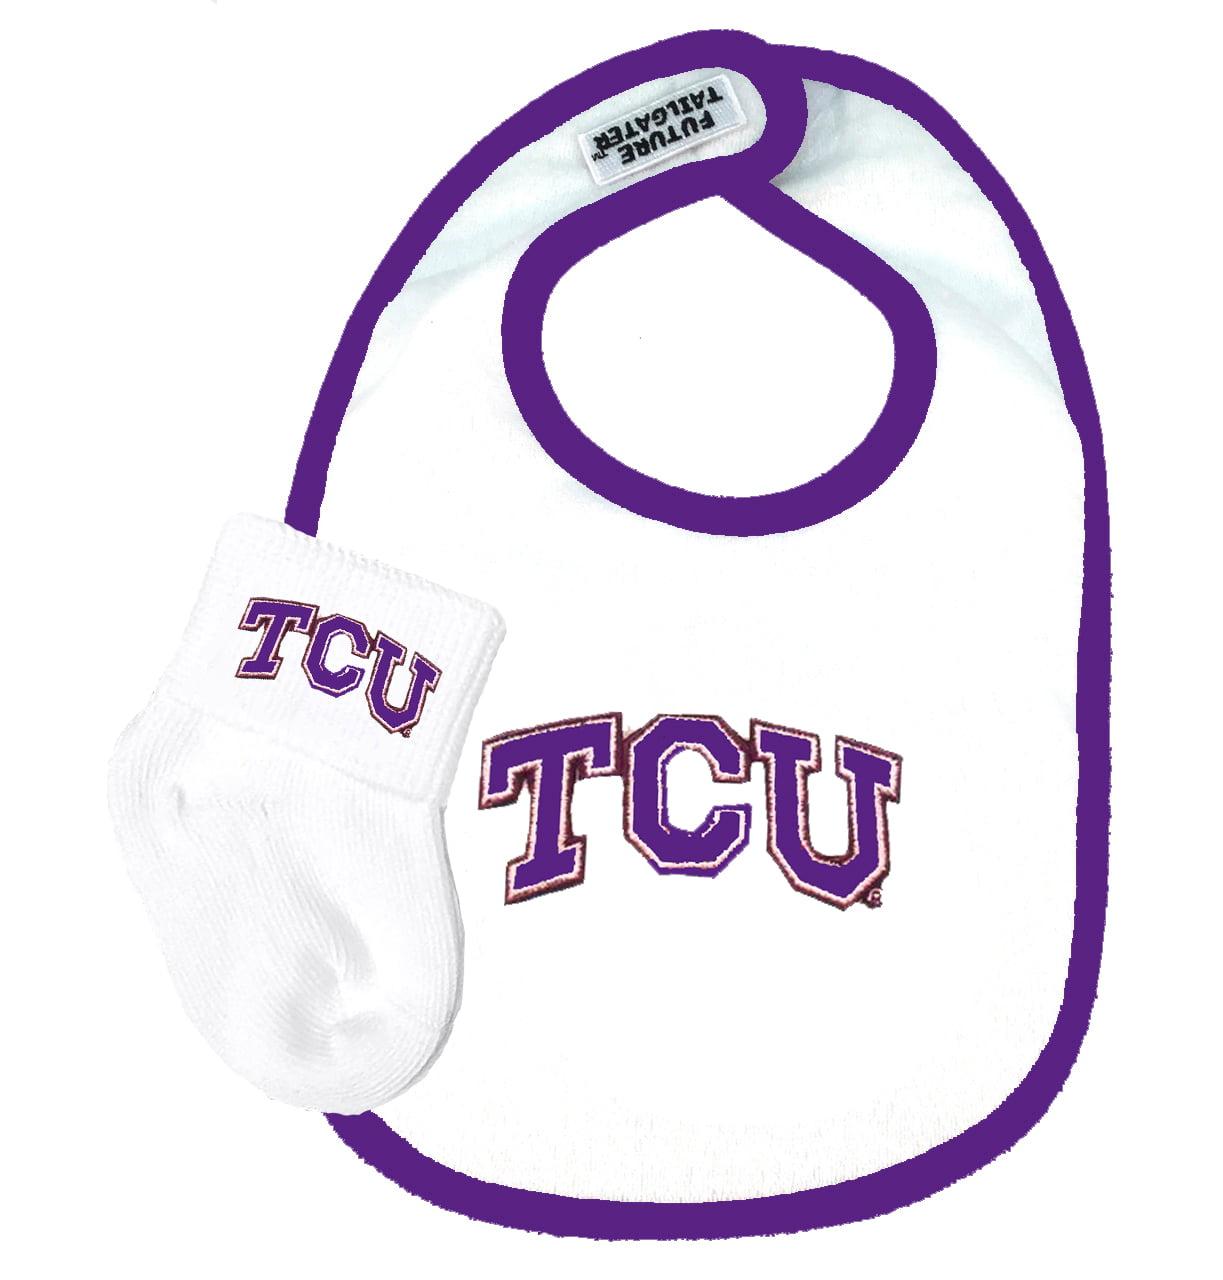 Texas Christian TCU Horned Frog Baby Bib and Socks Set